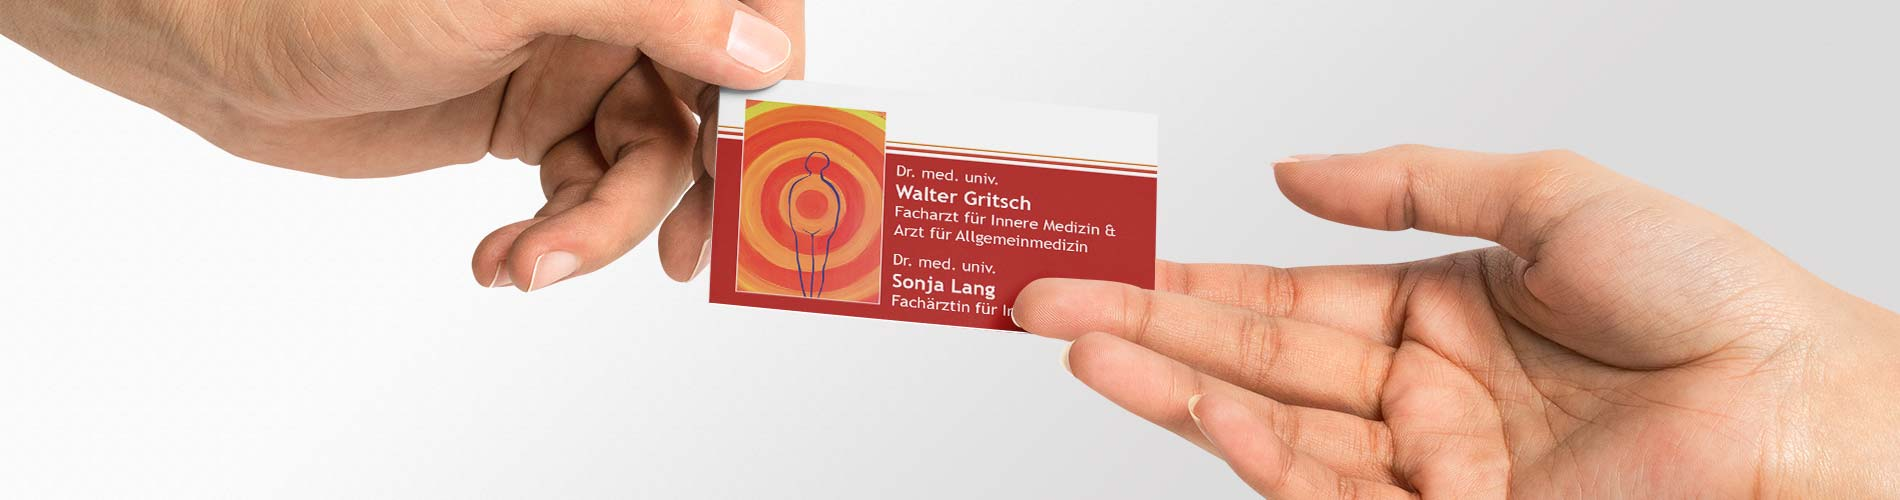 Kontakt und Anfahrt Dr Lang Dr Gritsch internisten innsbruck fulpmes